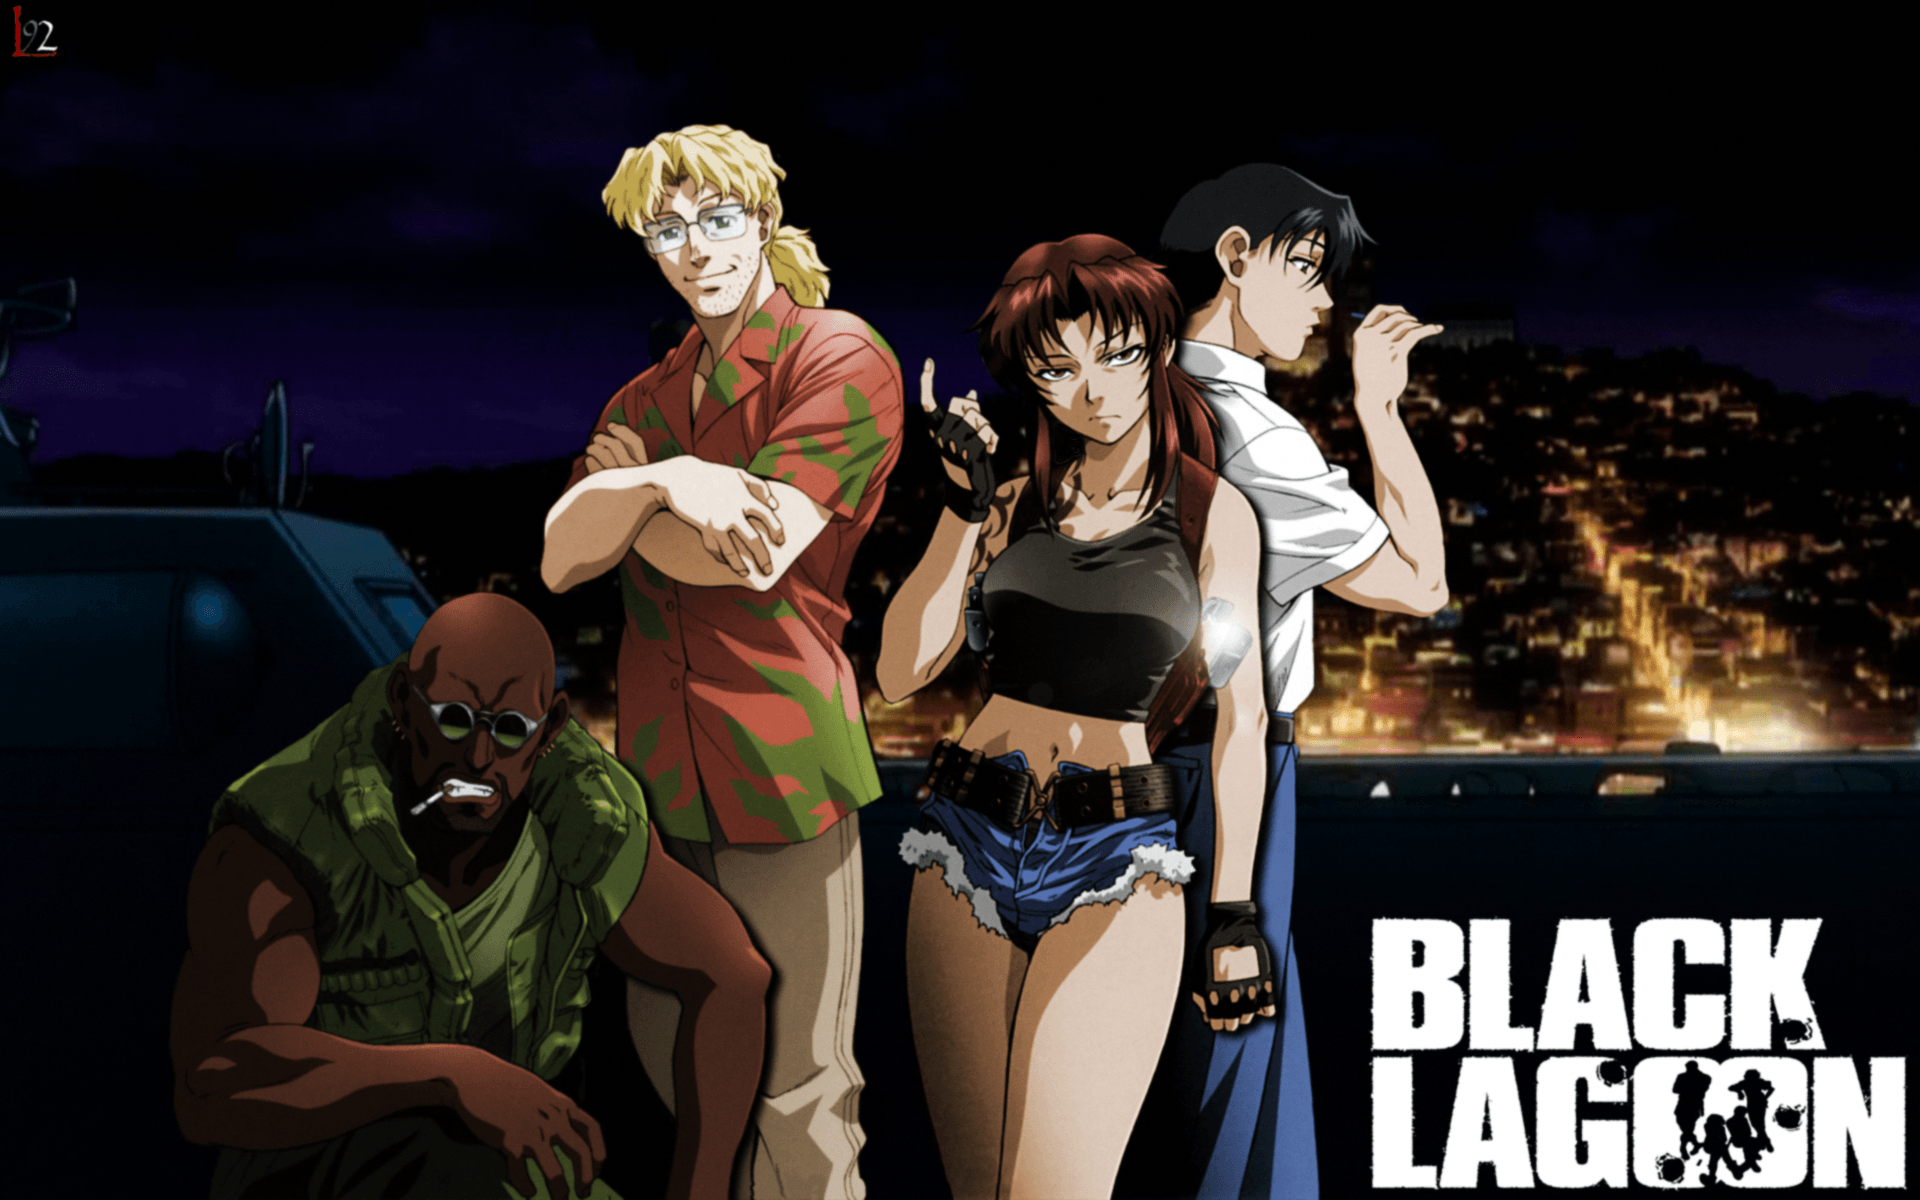 Black Lagoon Wallpapers Top Free Black Lagoon Backgrounds Wallpaperaccess